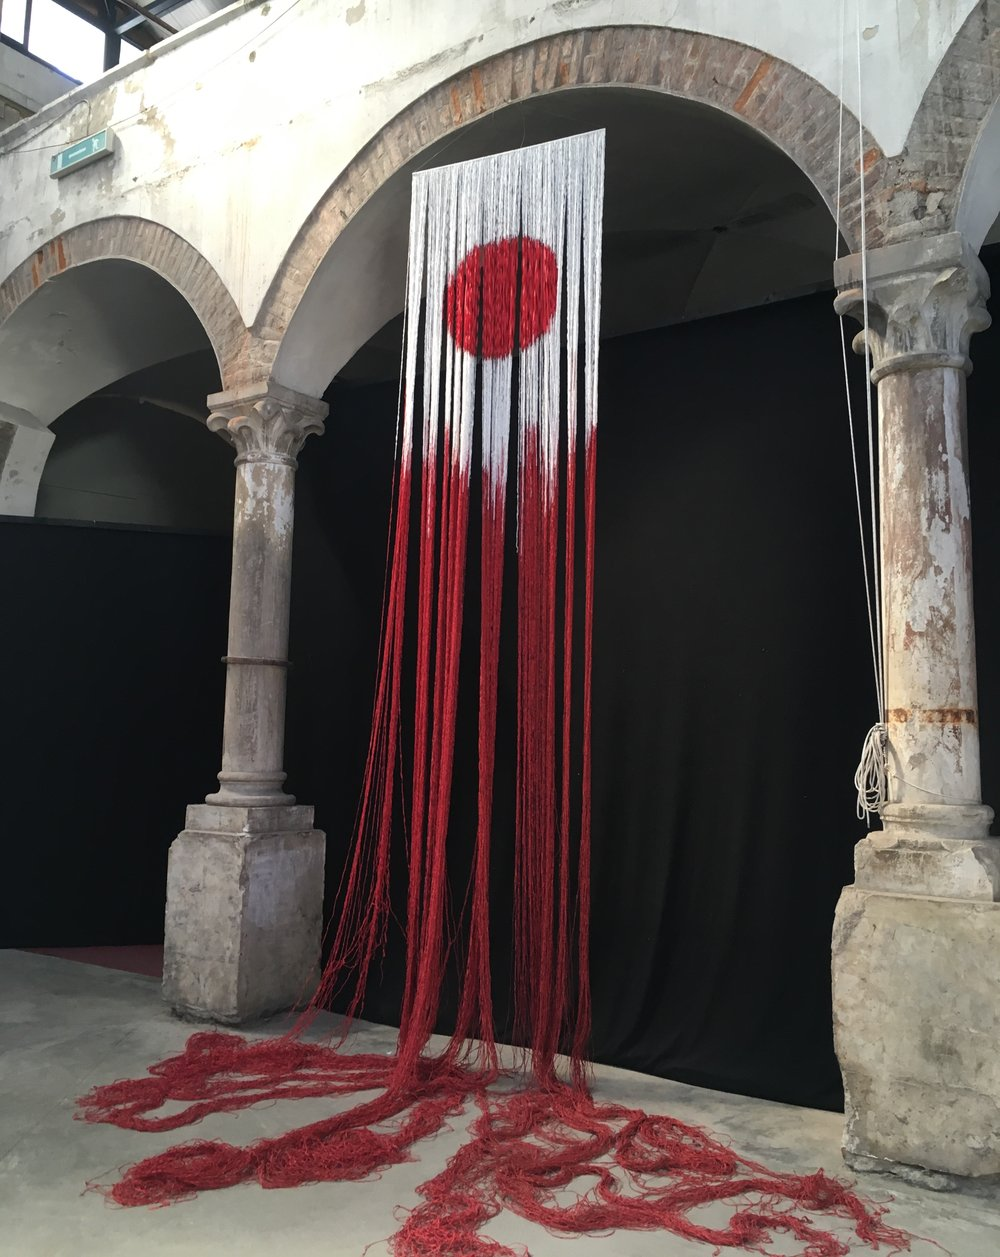 Radiate Eternal, Marie Schirrmacher-Metz, displayed in the old Mercato building